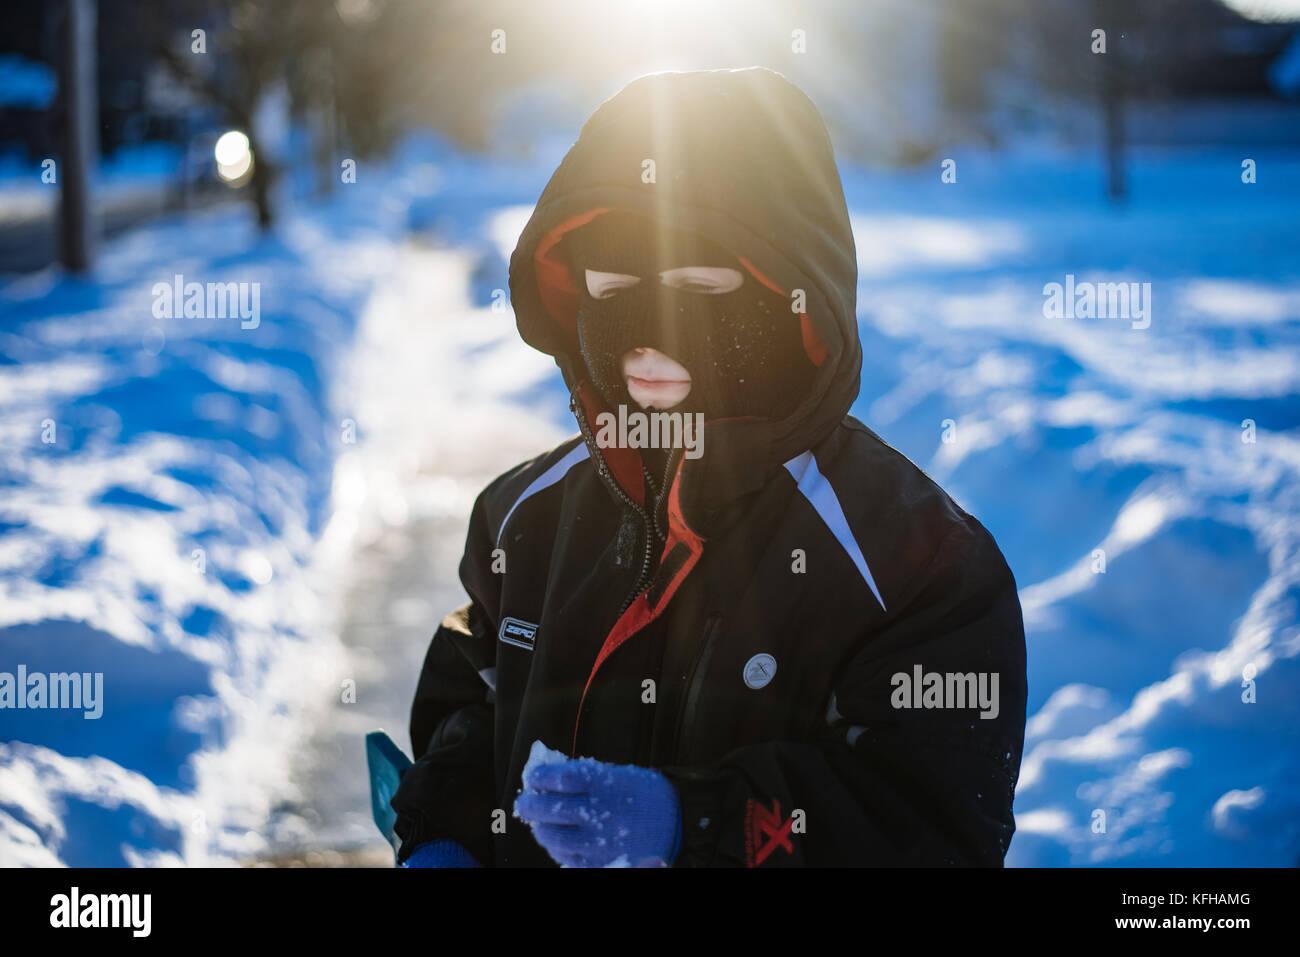 10-11 Jährige Junge im Schnee mit Ski Maske Stockbild